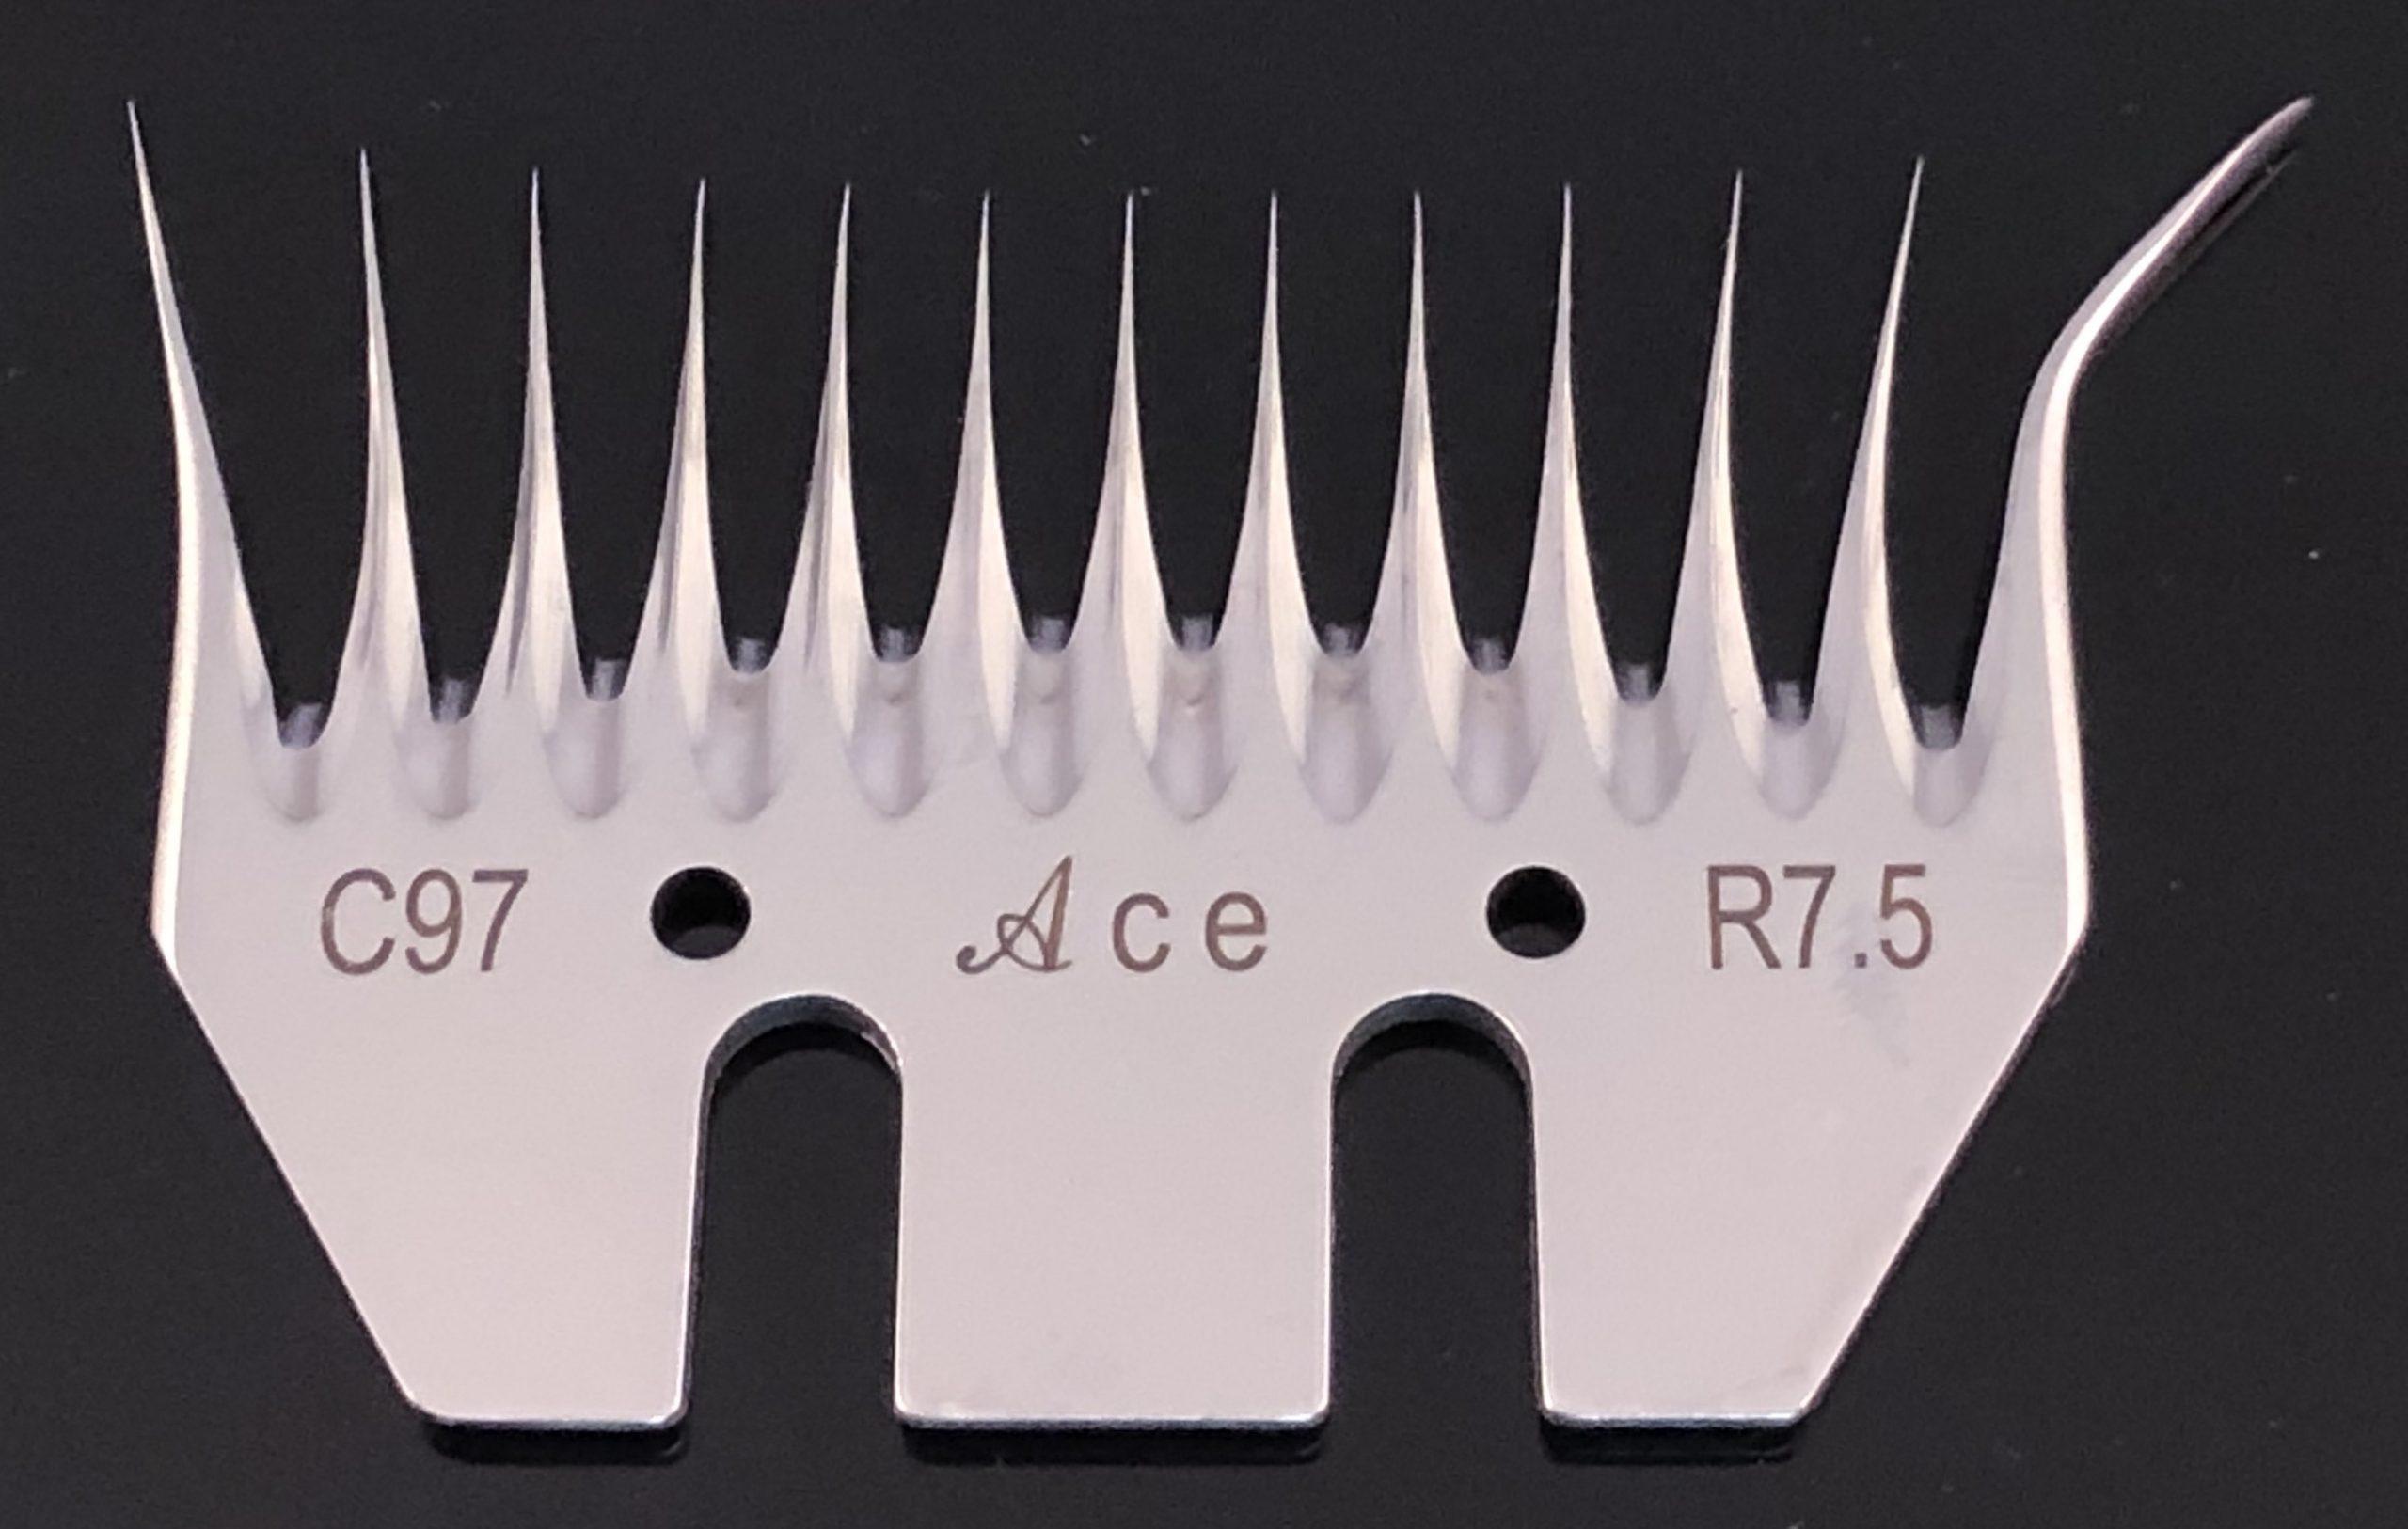 5 Reasons to Use Ace Shearing Combs Before Lambing